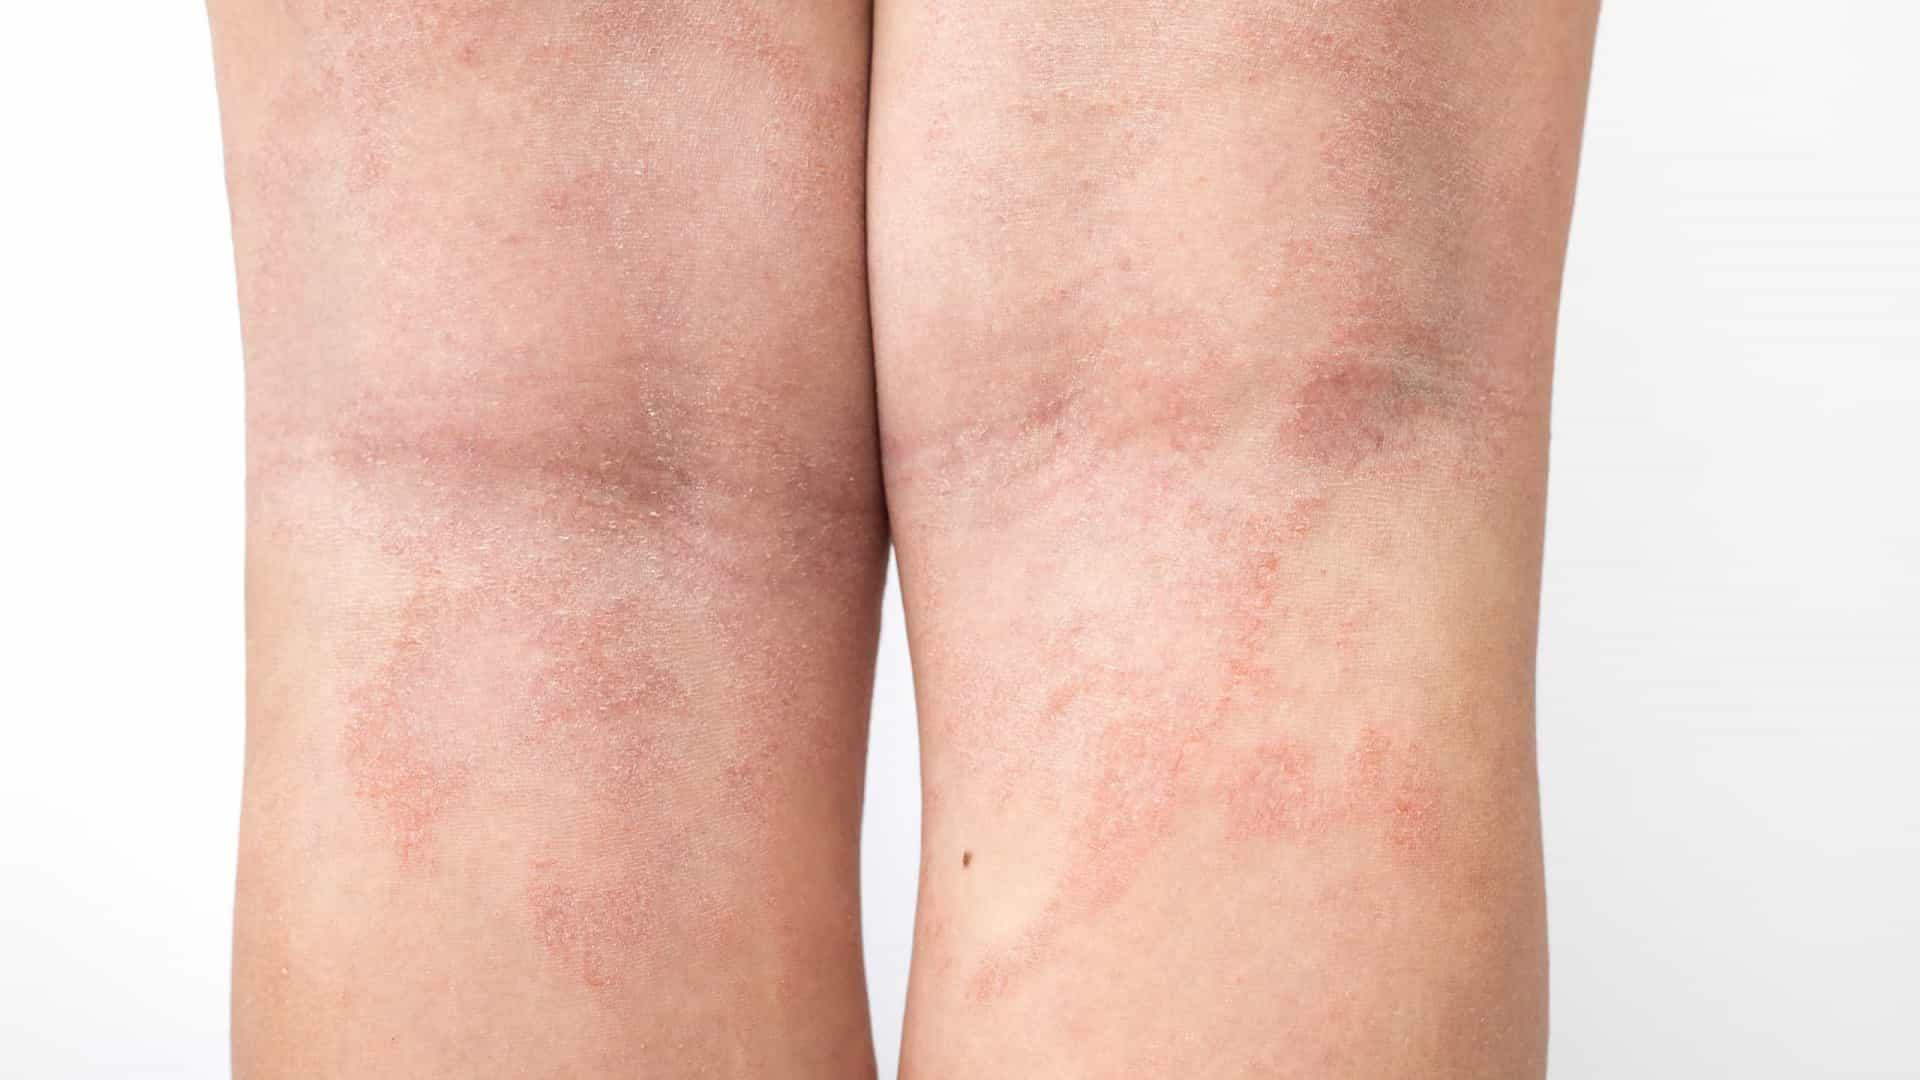 Problemas na pele pode ser indicativo de Covid-19 (Foto: Shutterstock)